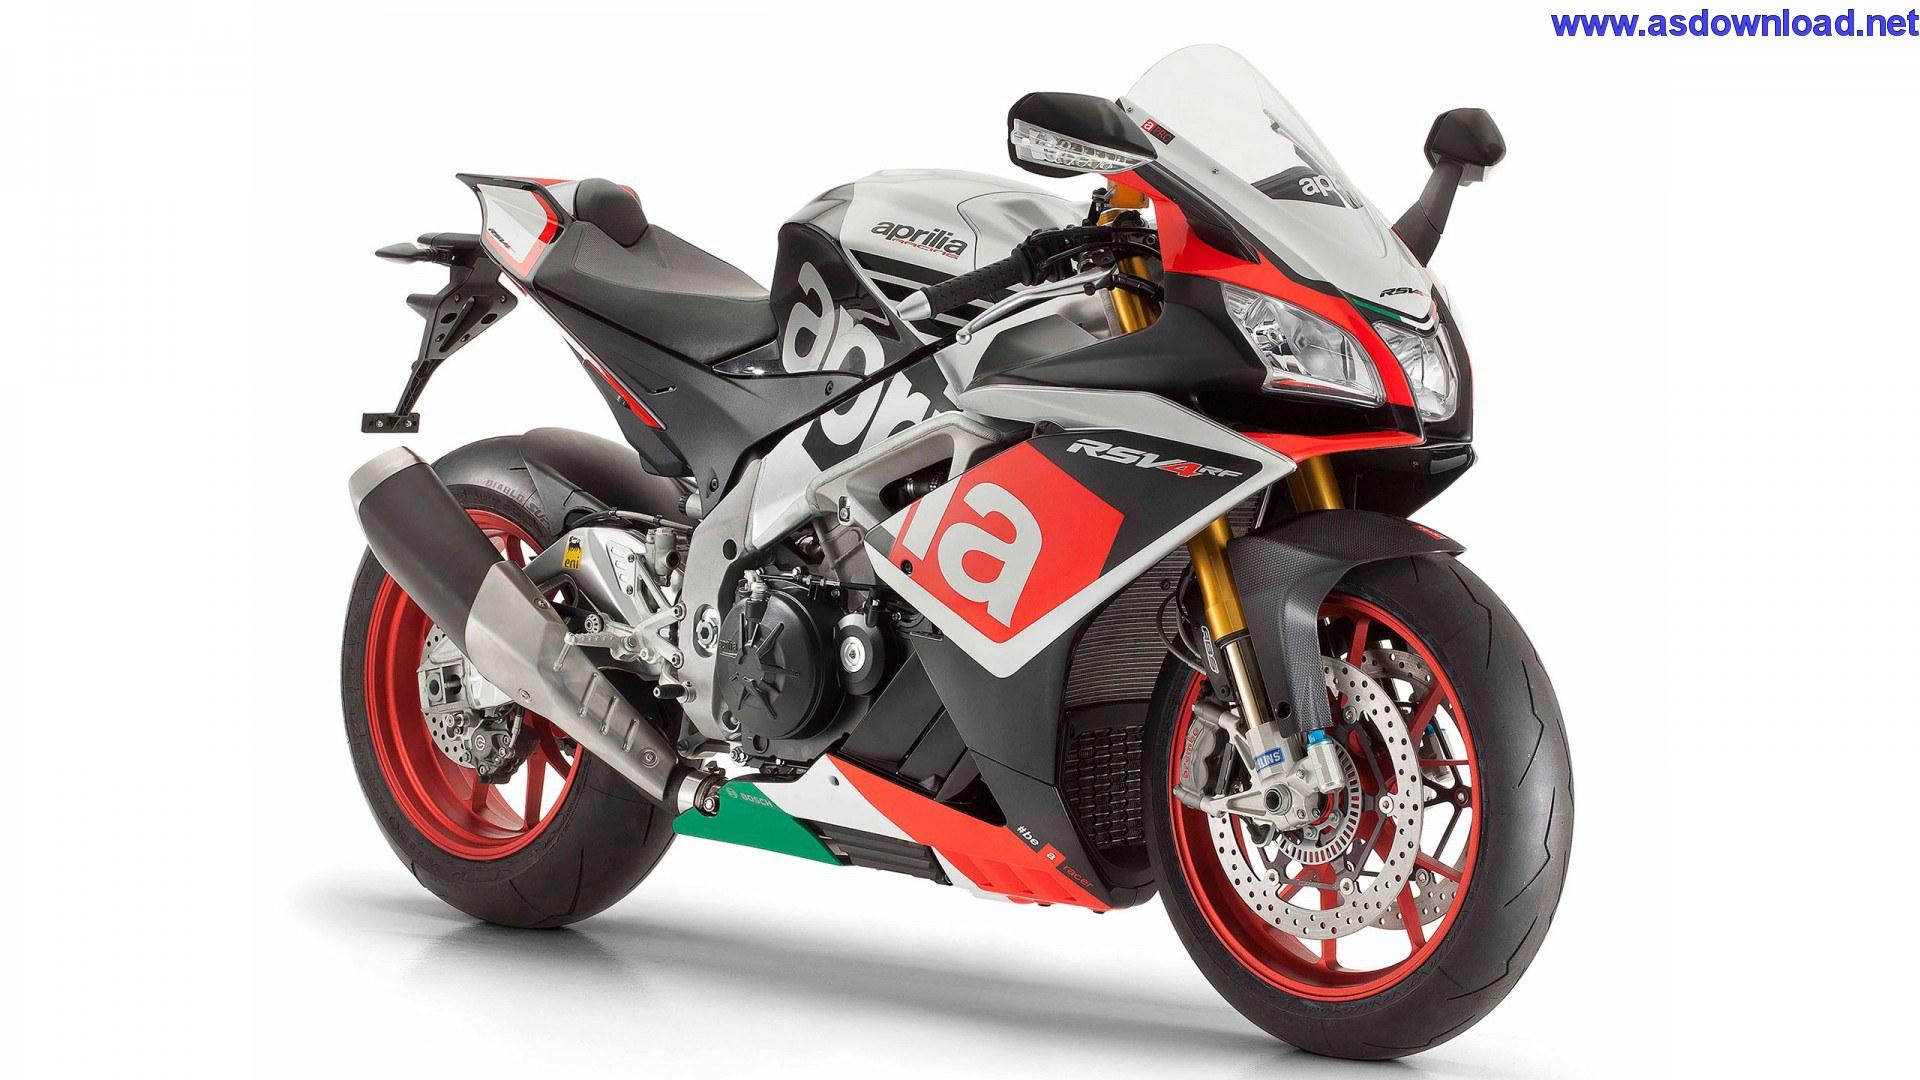 2015 Aprilia RSV4 RF Wallpaper دانلود عکس گرانترین, سریعترین و قوی ترین موتورسیکلت های جهان مدل 2015